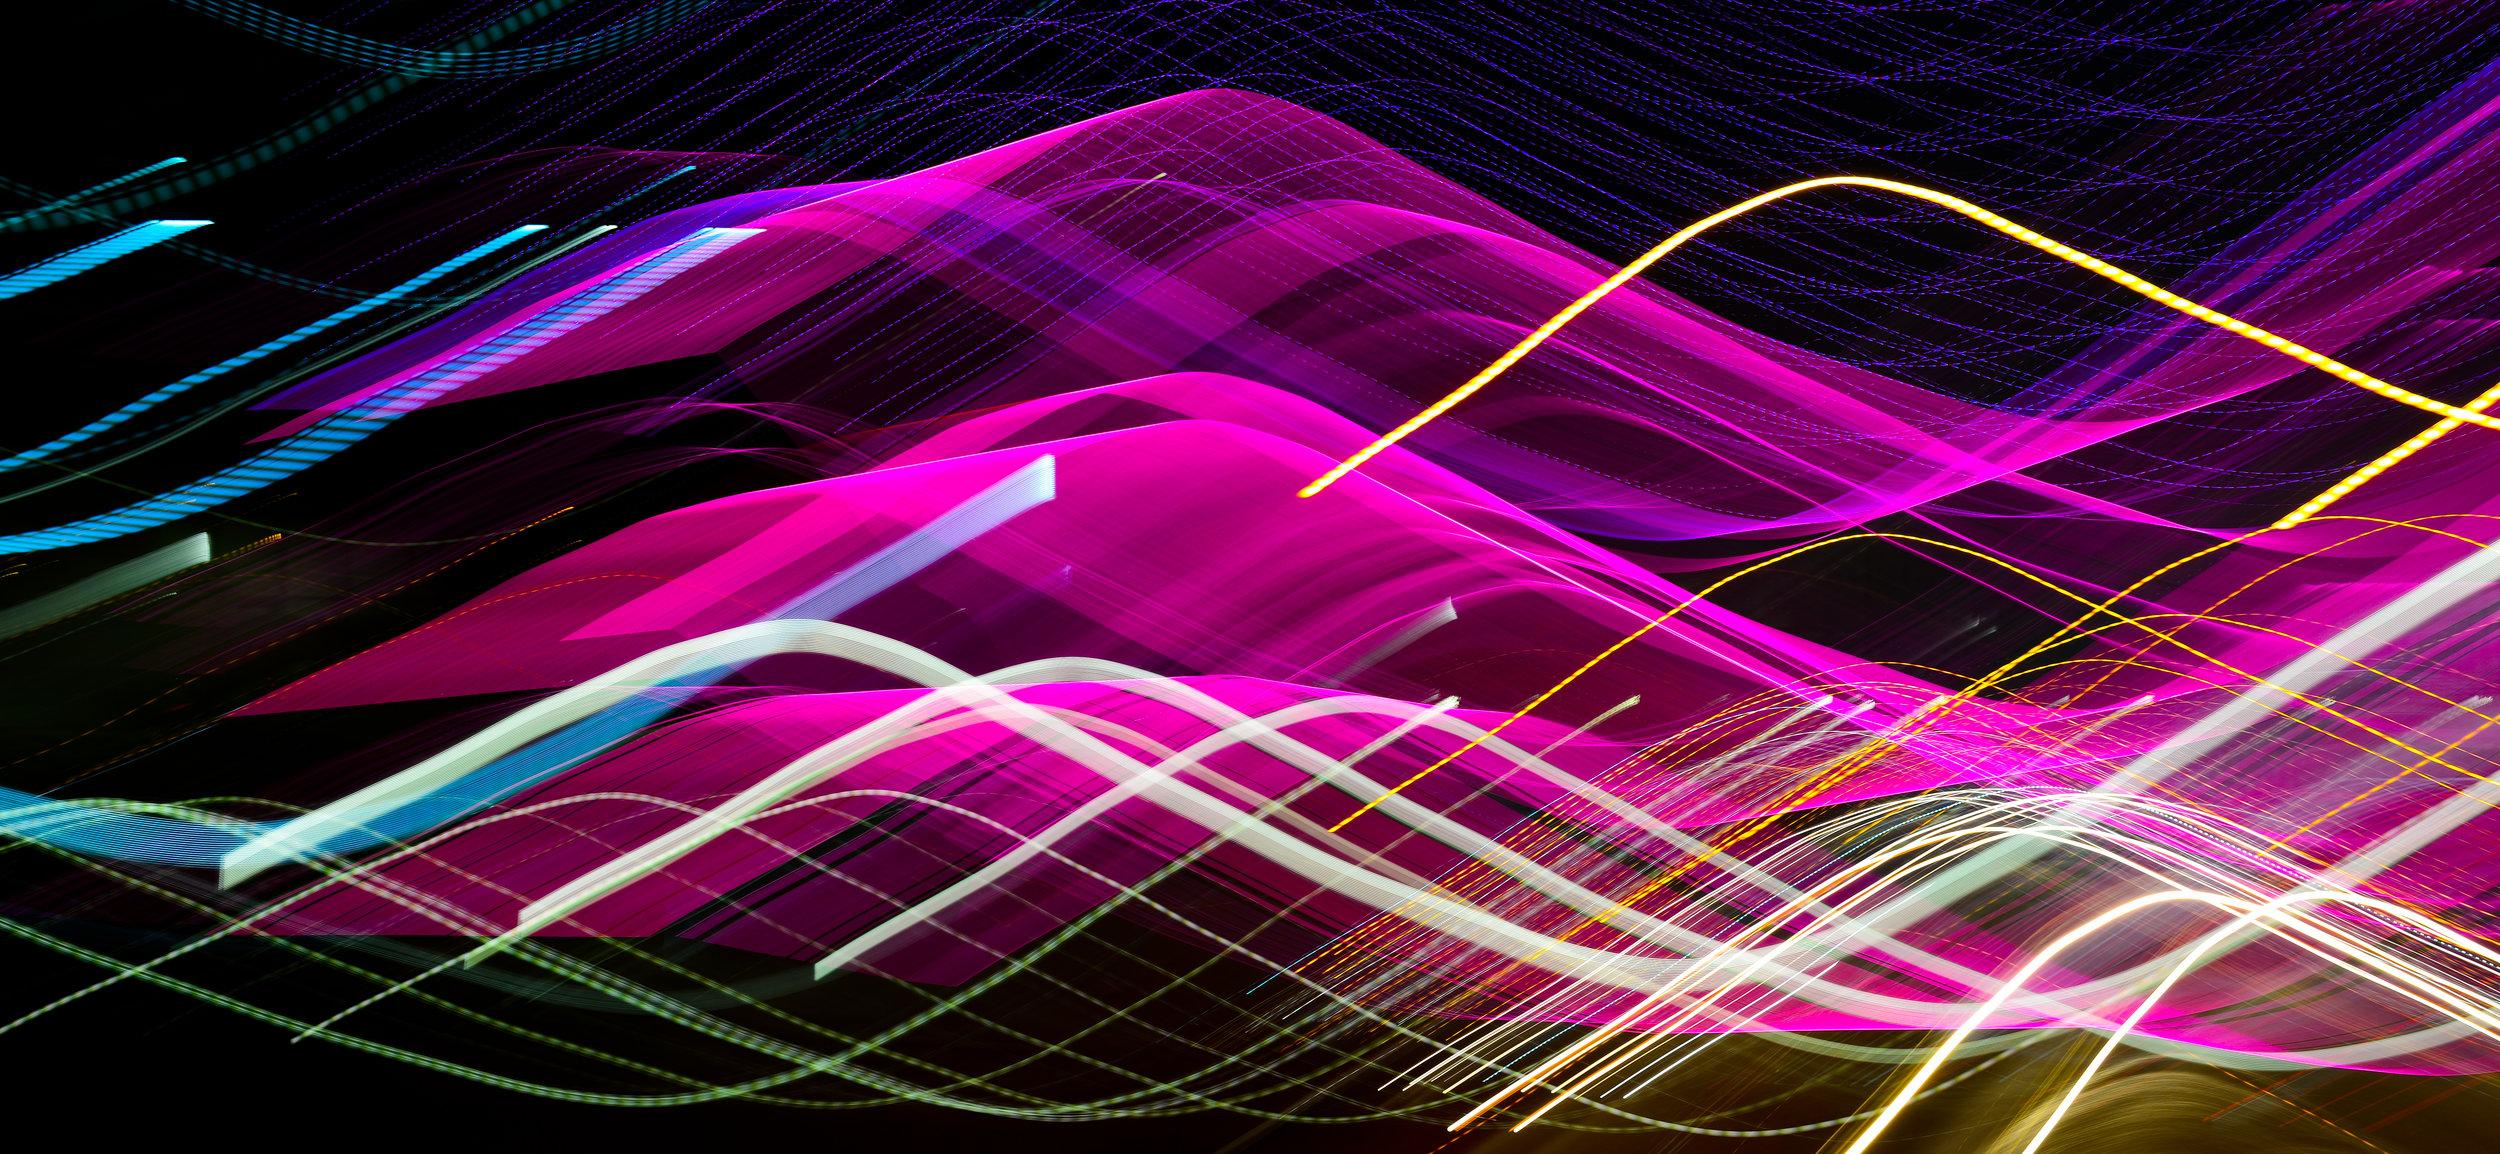 "Sine City    Long exposure - Sine waves cut through the night  35mm f8 1.6"" ISO 100"